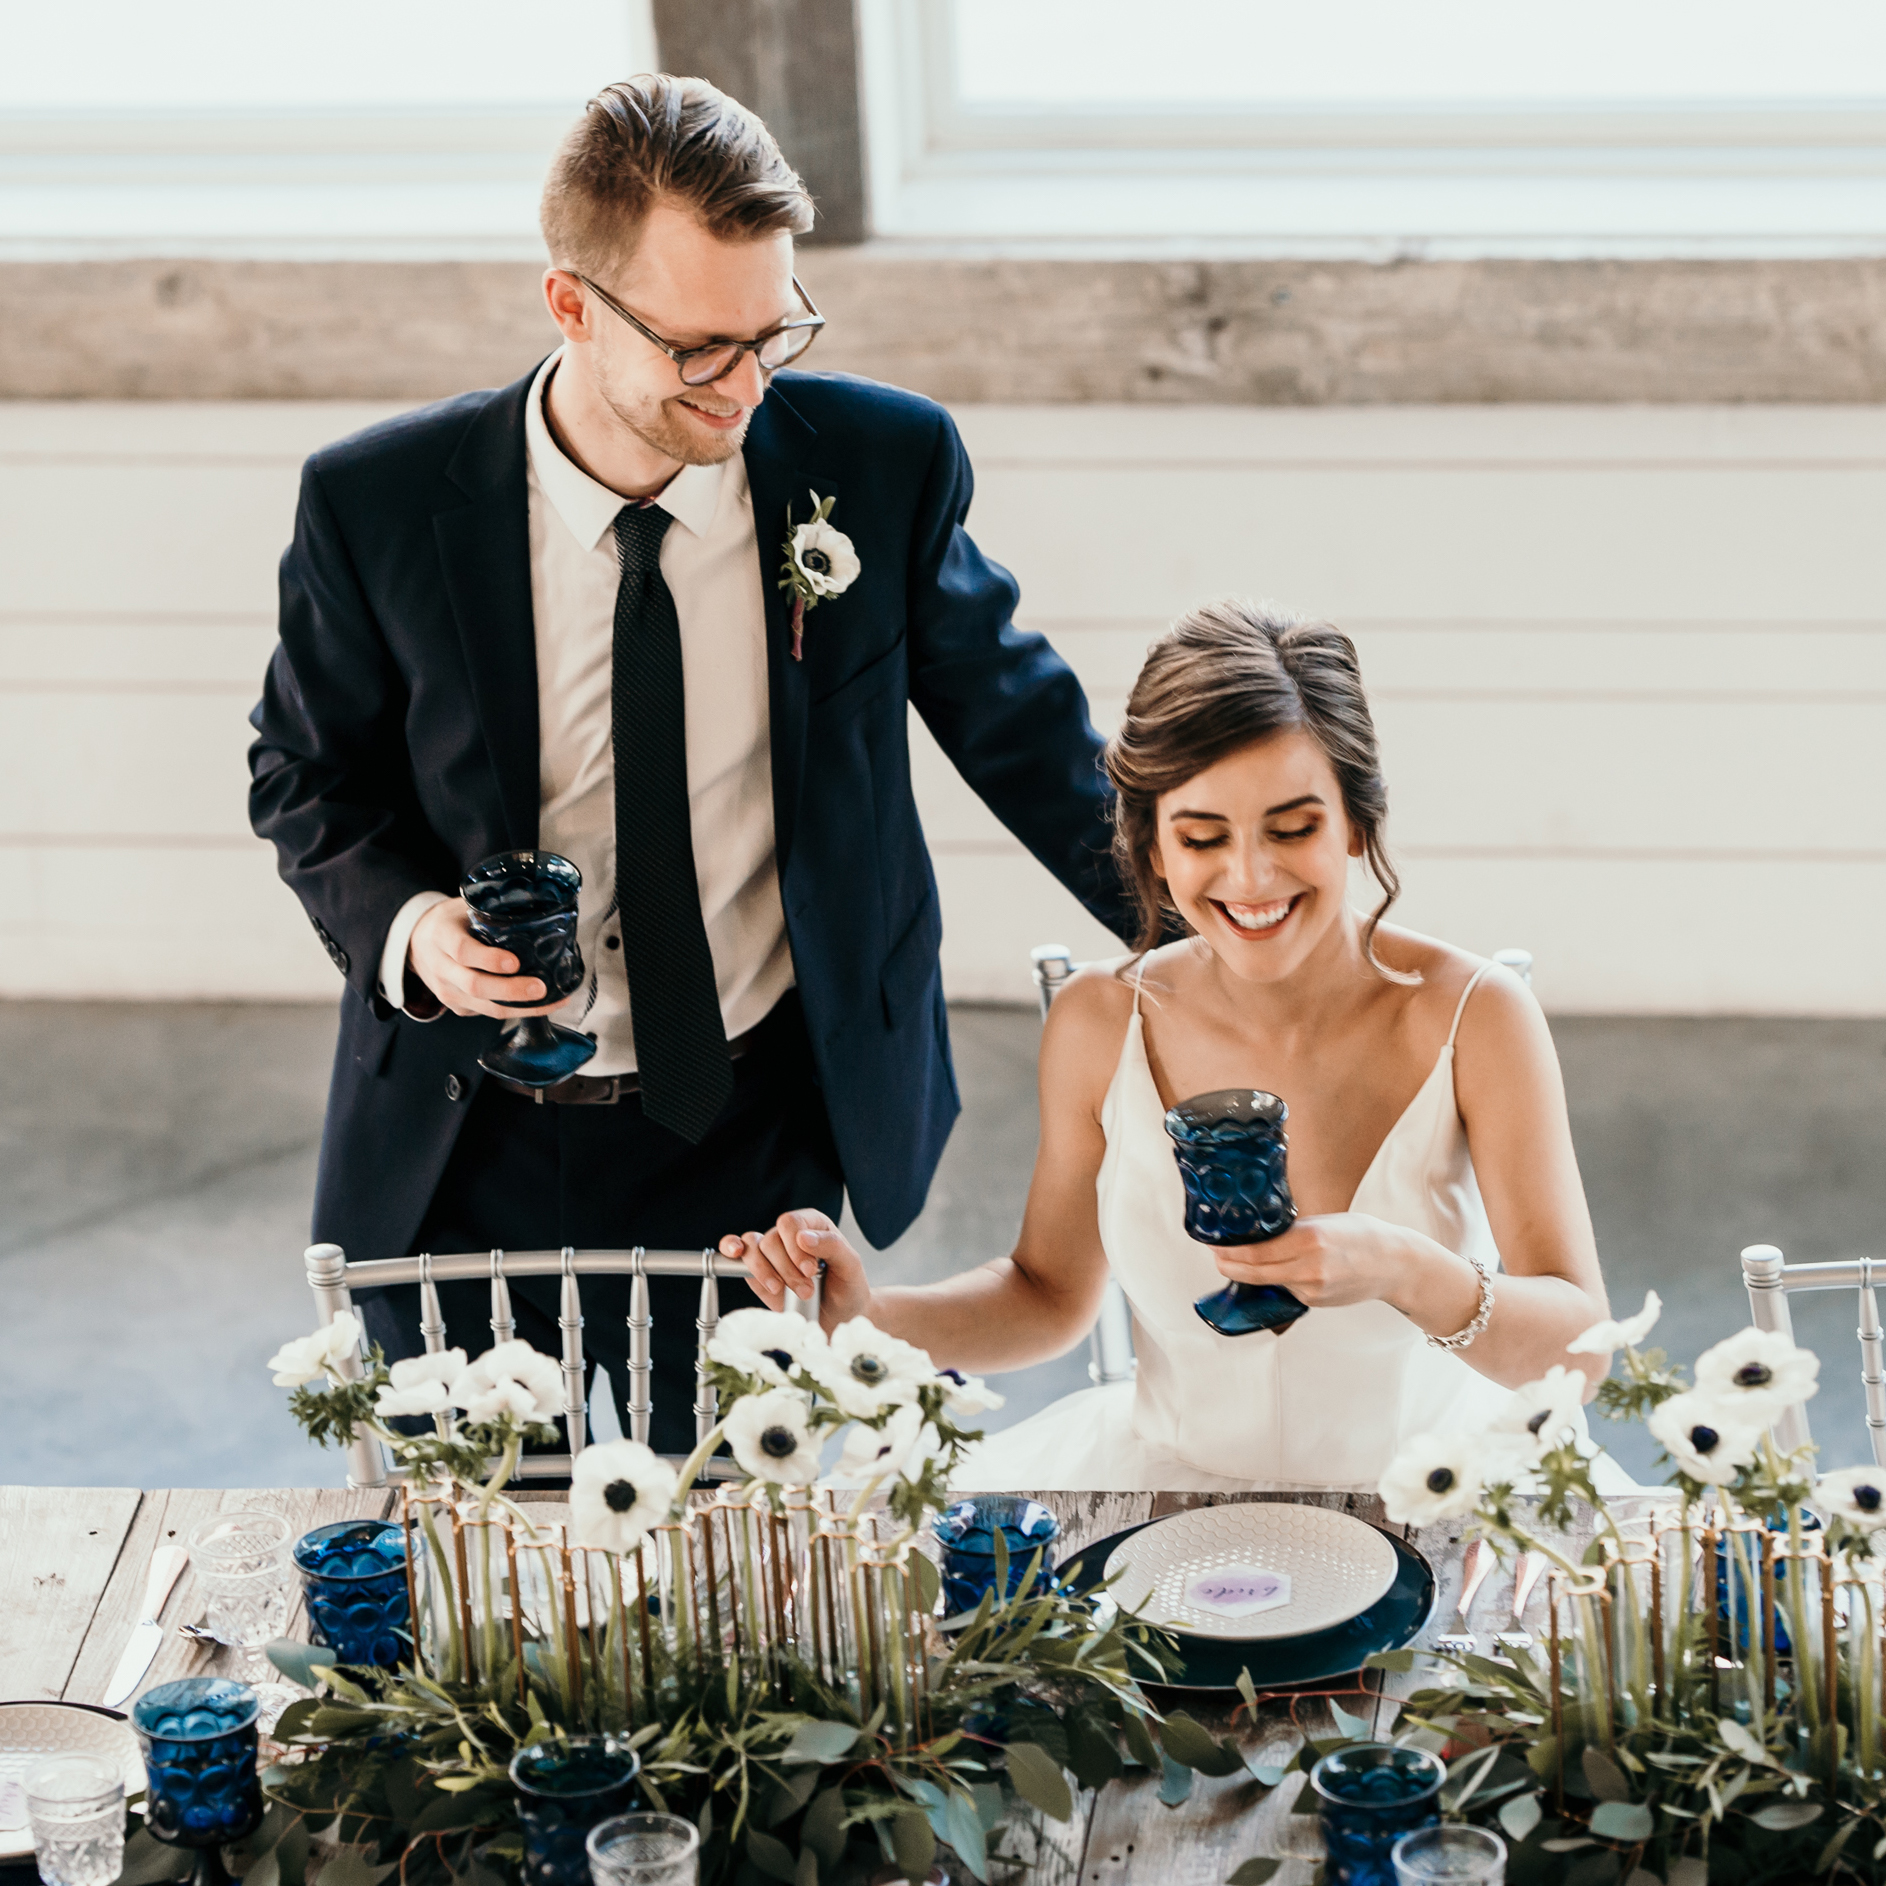 022 Jewel Tone Wedding Styled Shoot_Silver Knot_Montana Wedding Planner_Montana Wedding Photographer_Montana Wedding Videography_Honeybee Weddings-1303.jpg